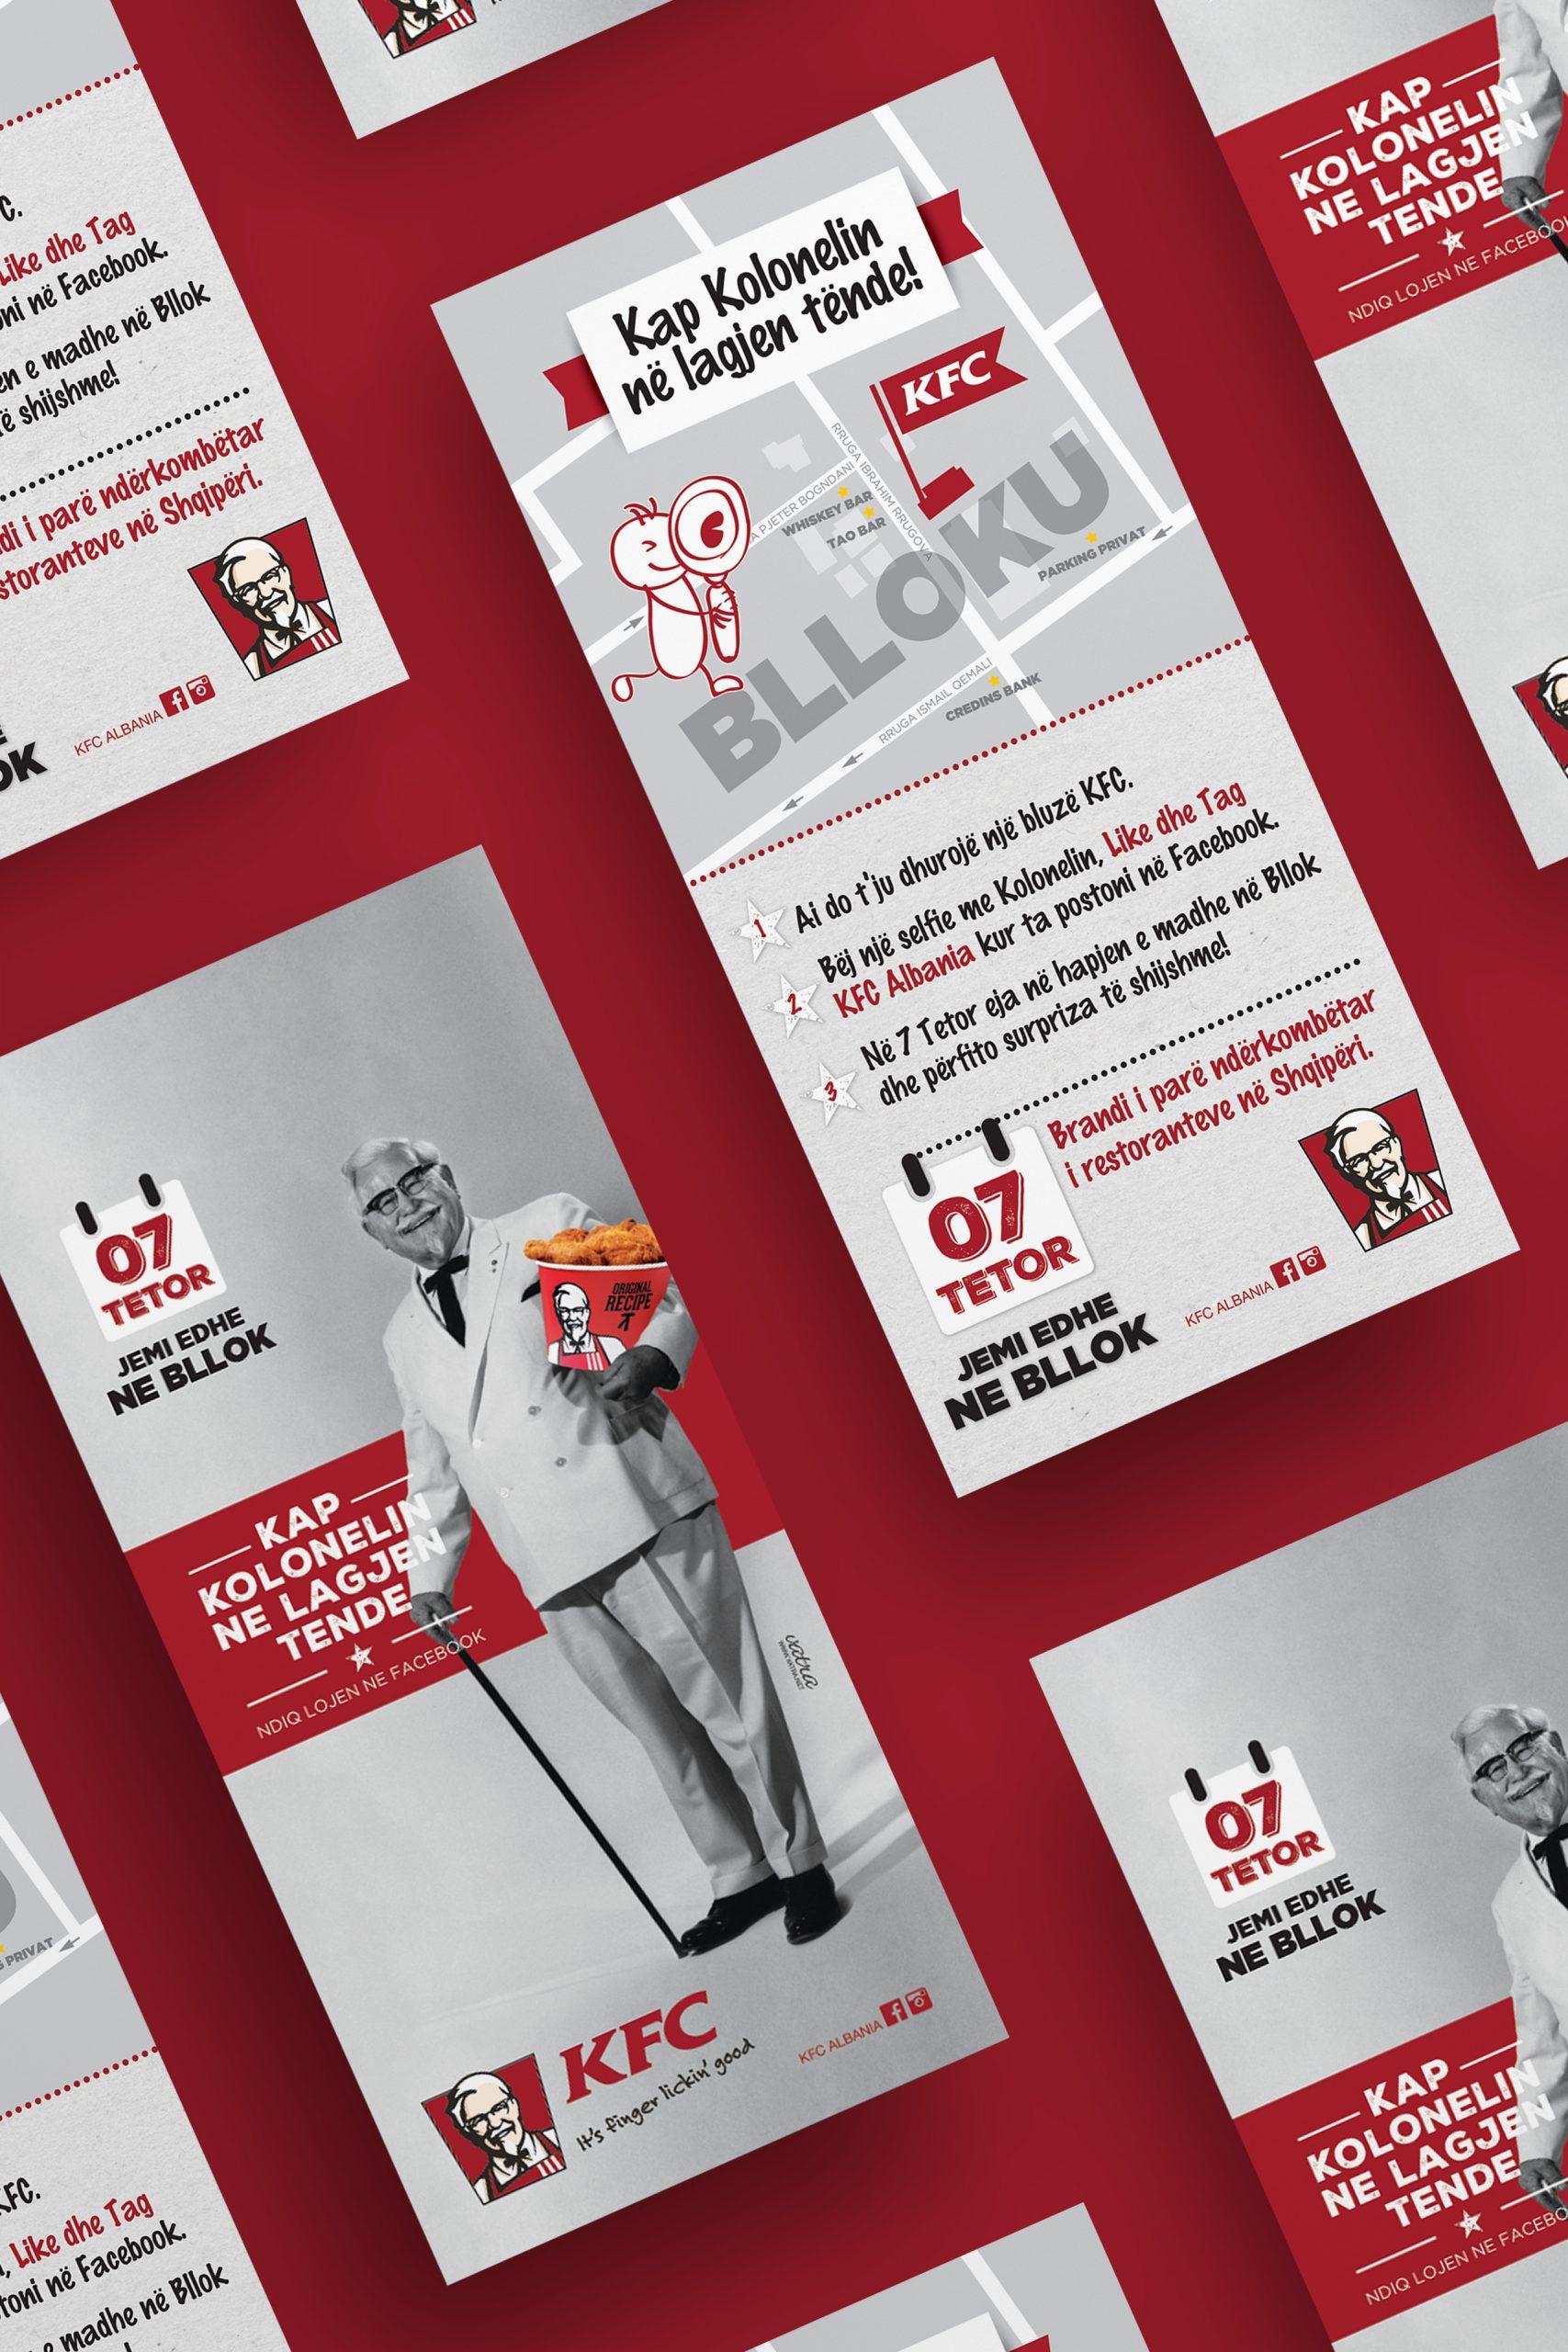 KFC, Social, Project Img 9 - Vatra Agency / Founder & CEO Gerton Bejo